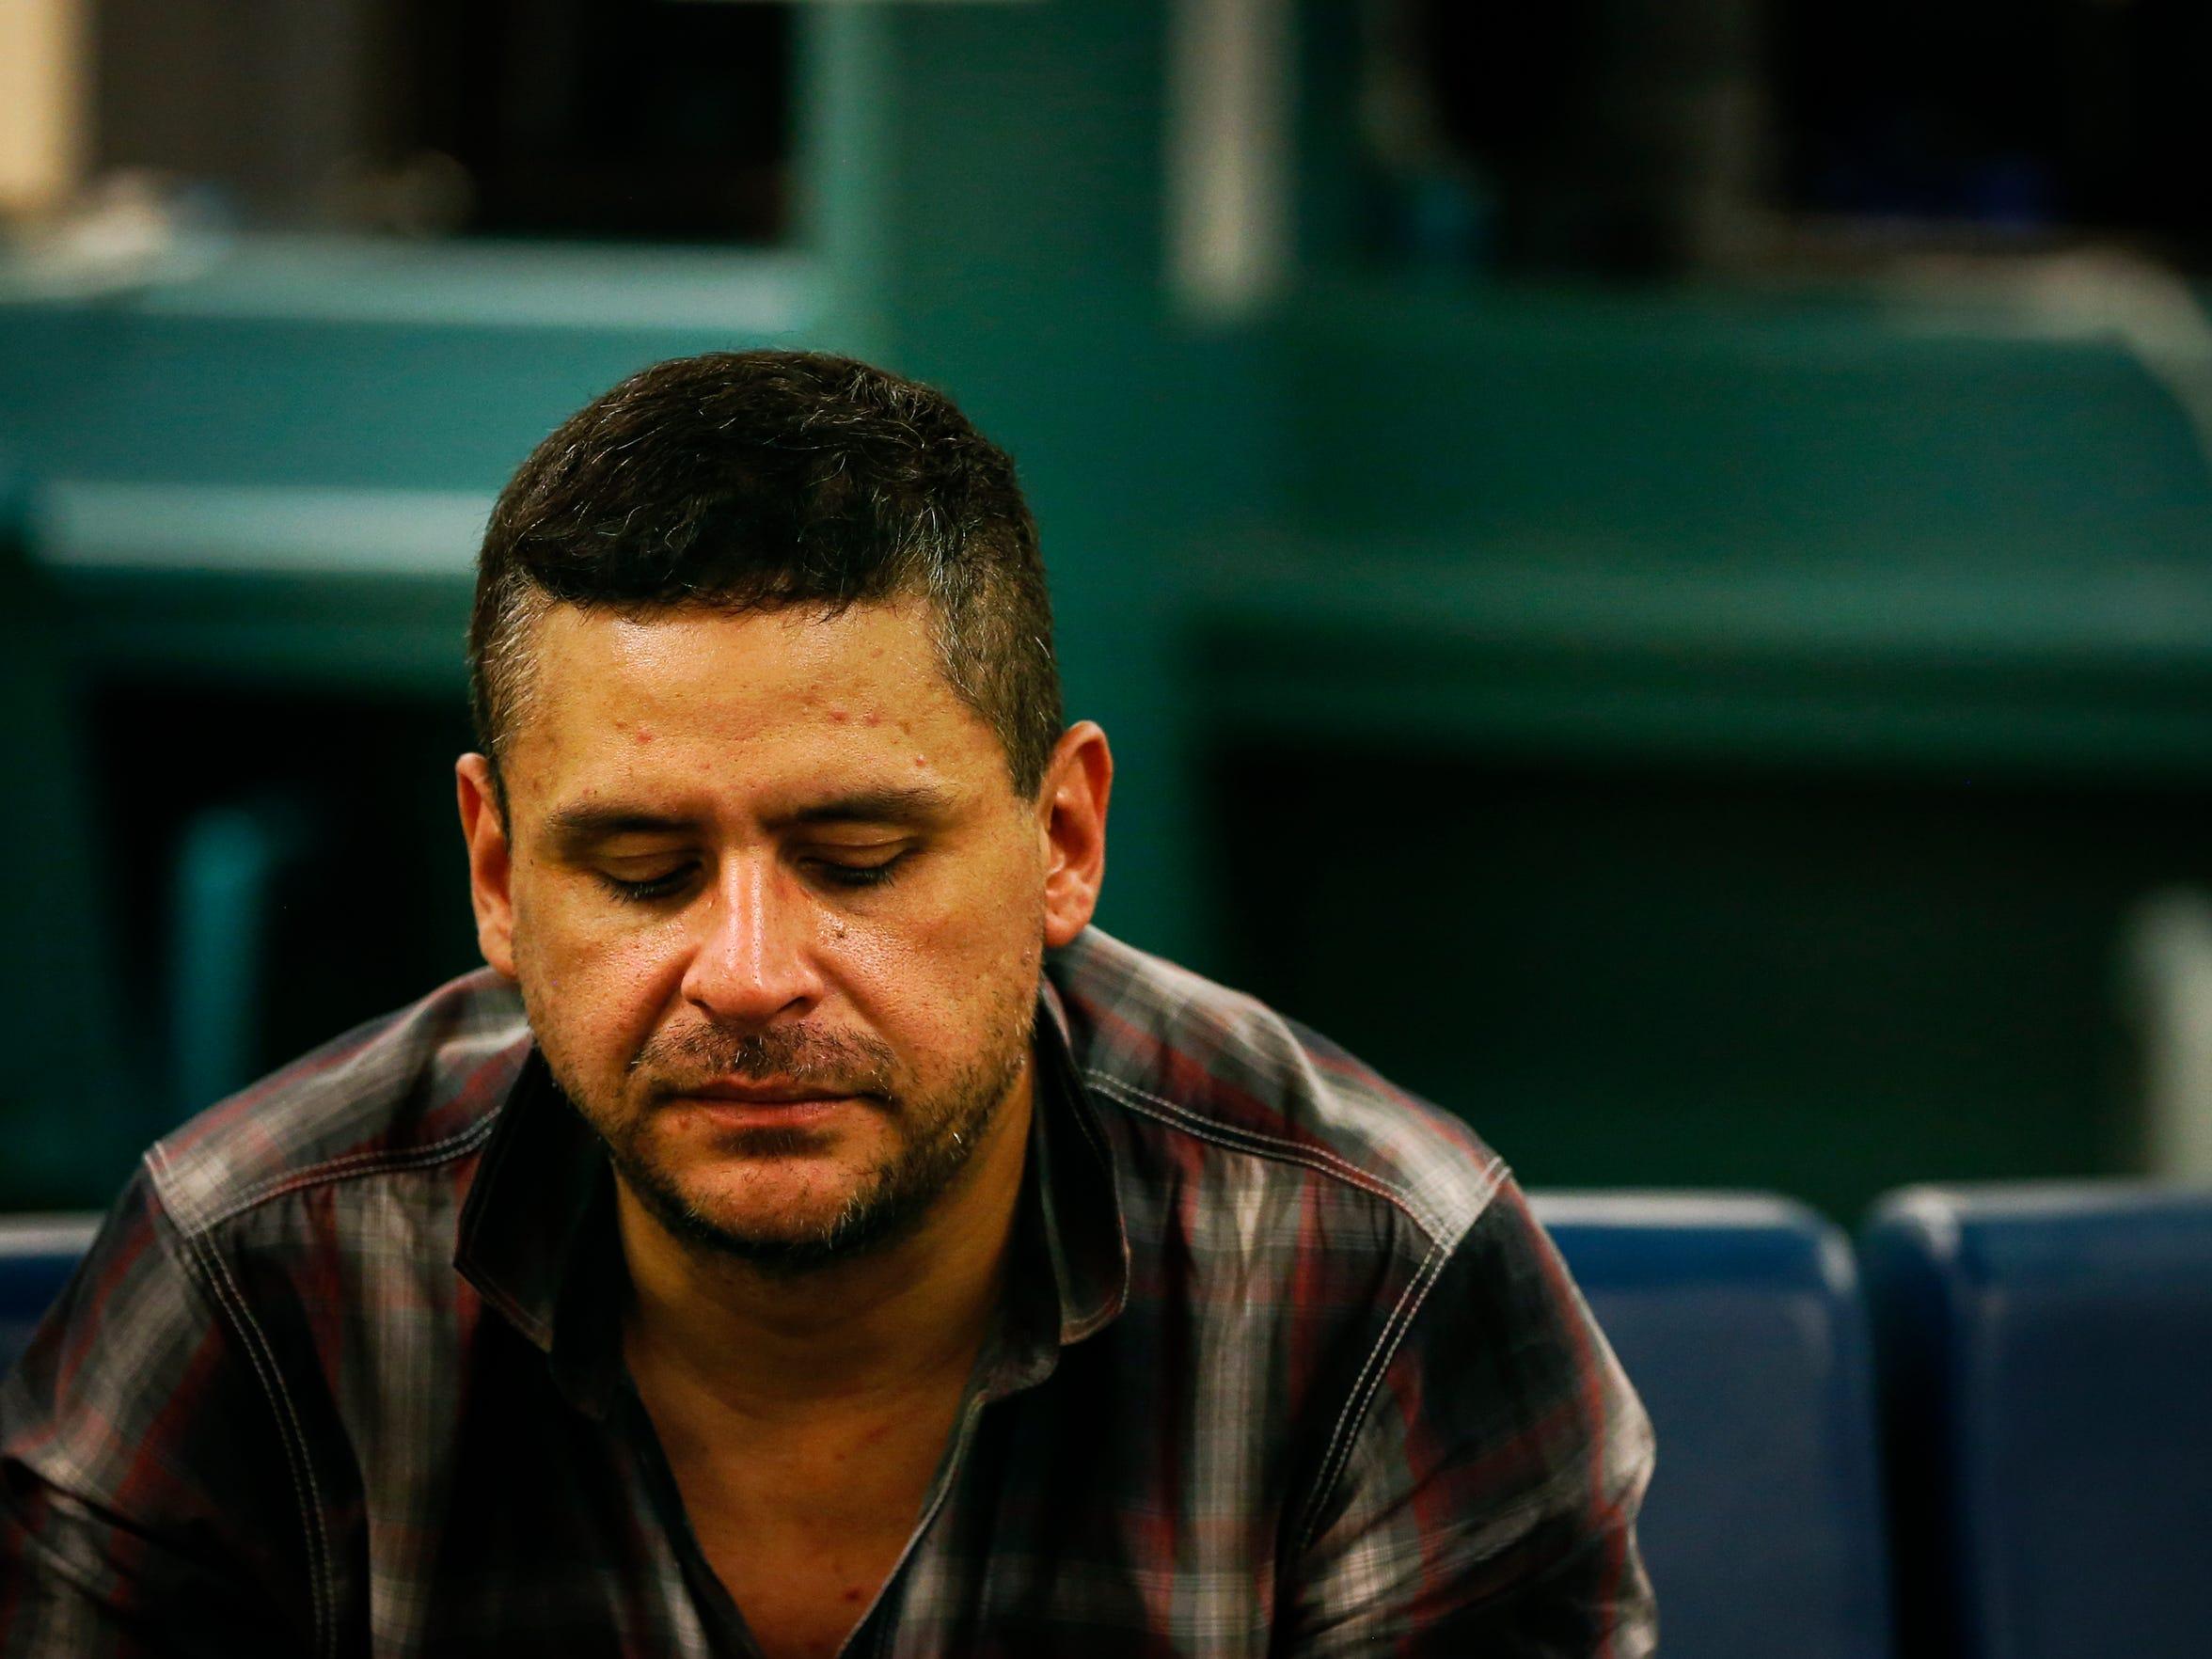 41-year-old John Palao waits in Metro Corrections booking